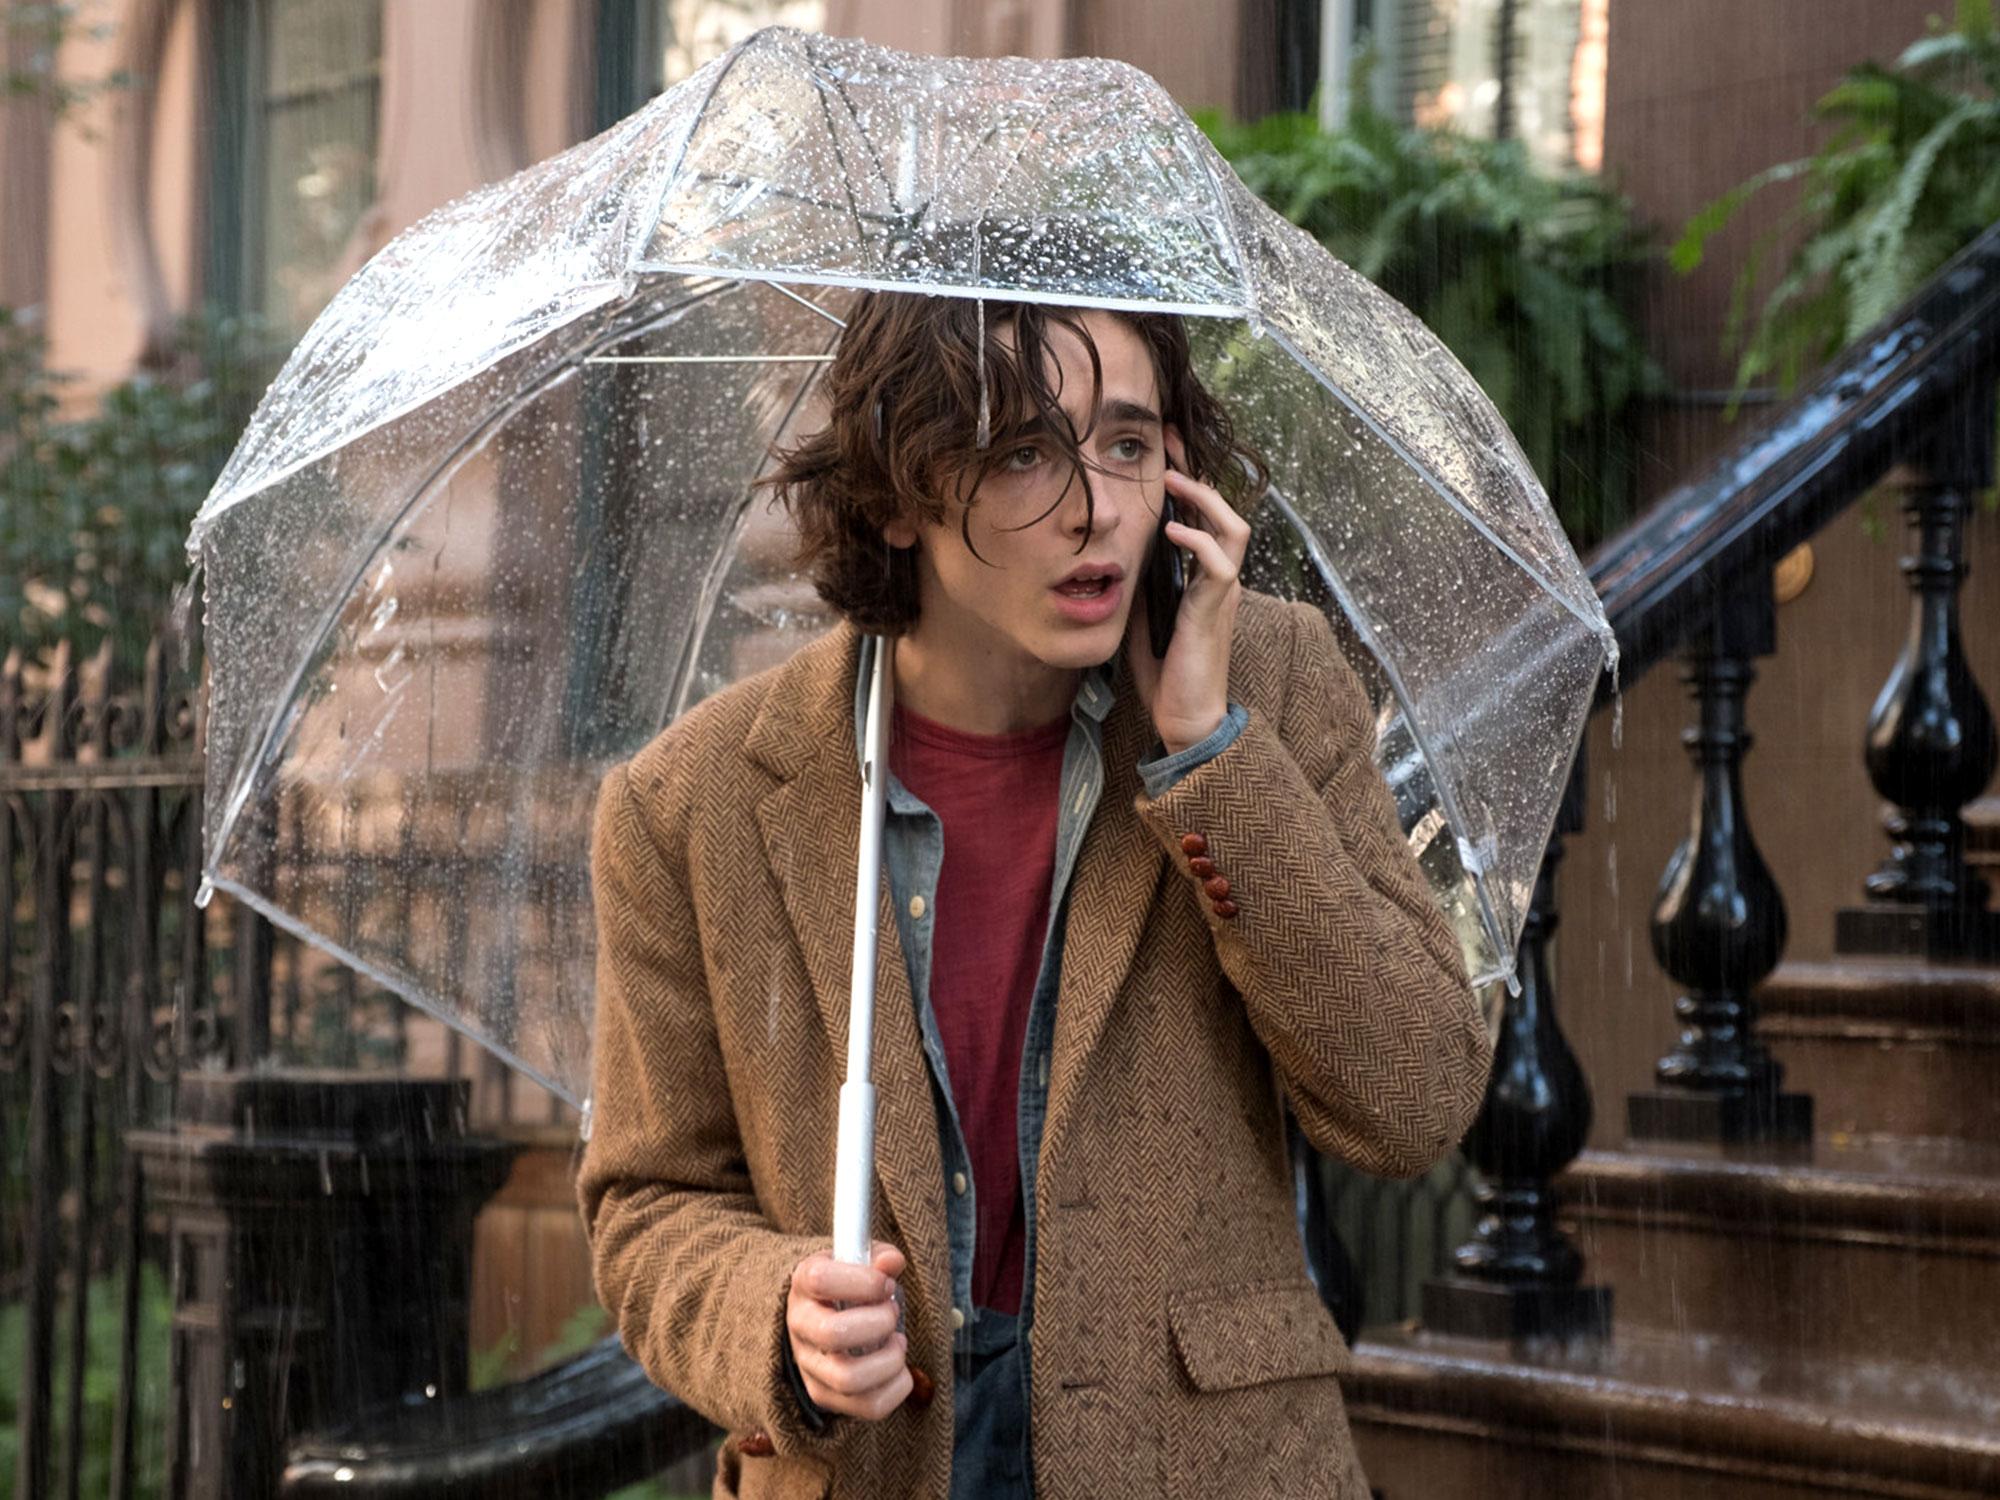 дощовий день у нью-йорку